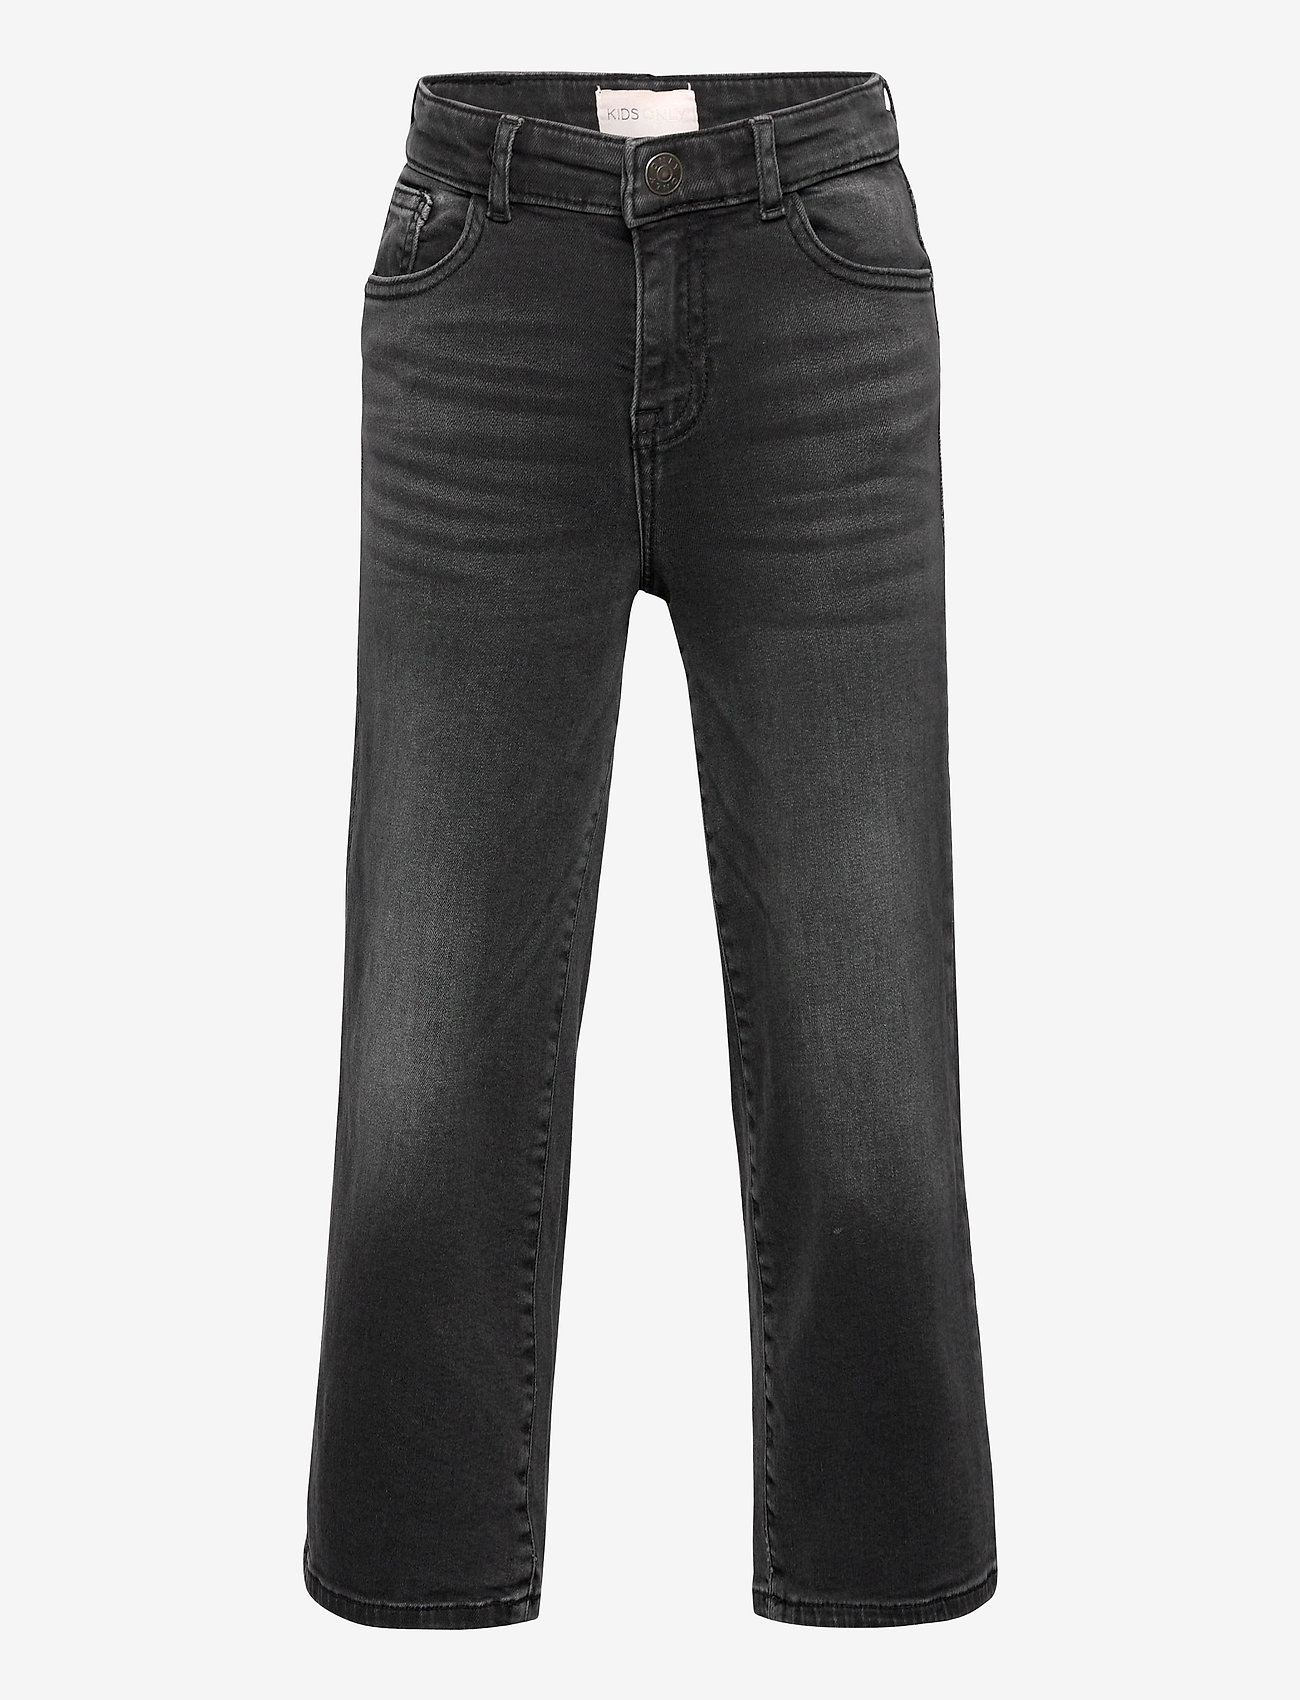 Kids Only - KONMADISON LIFE HW WIDE BLACK JEANS DNM - jeans - black - 0